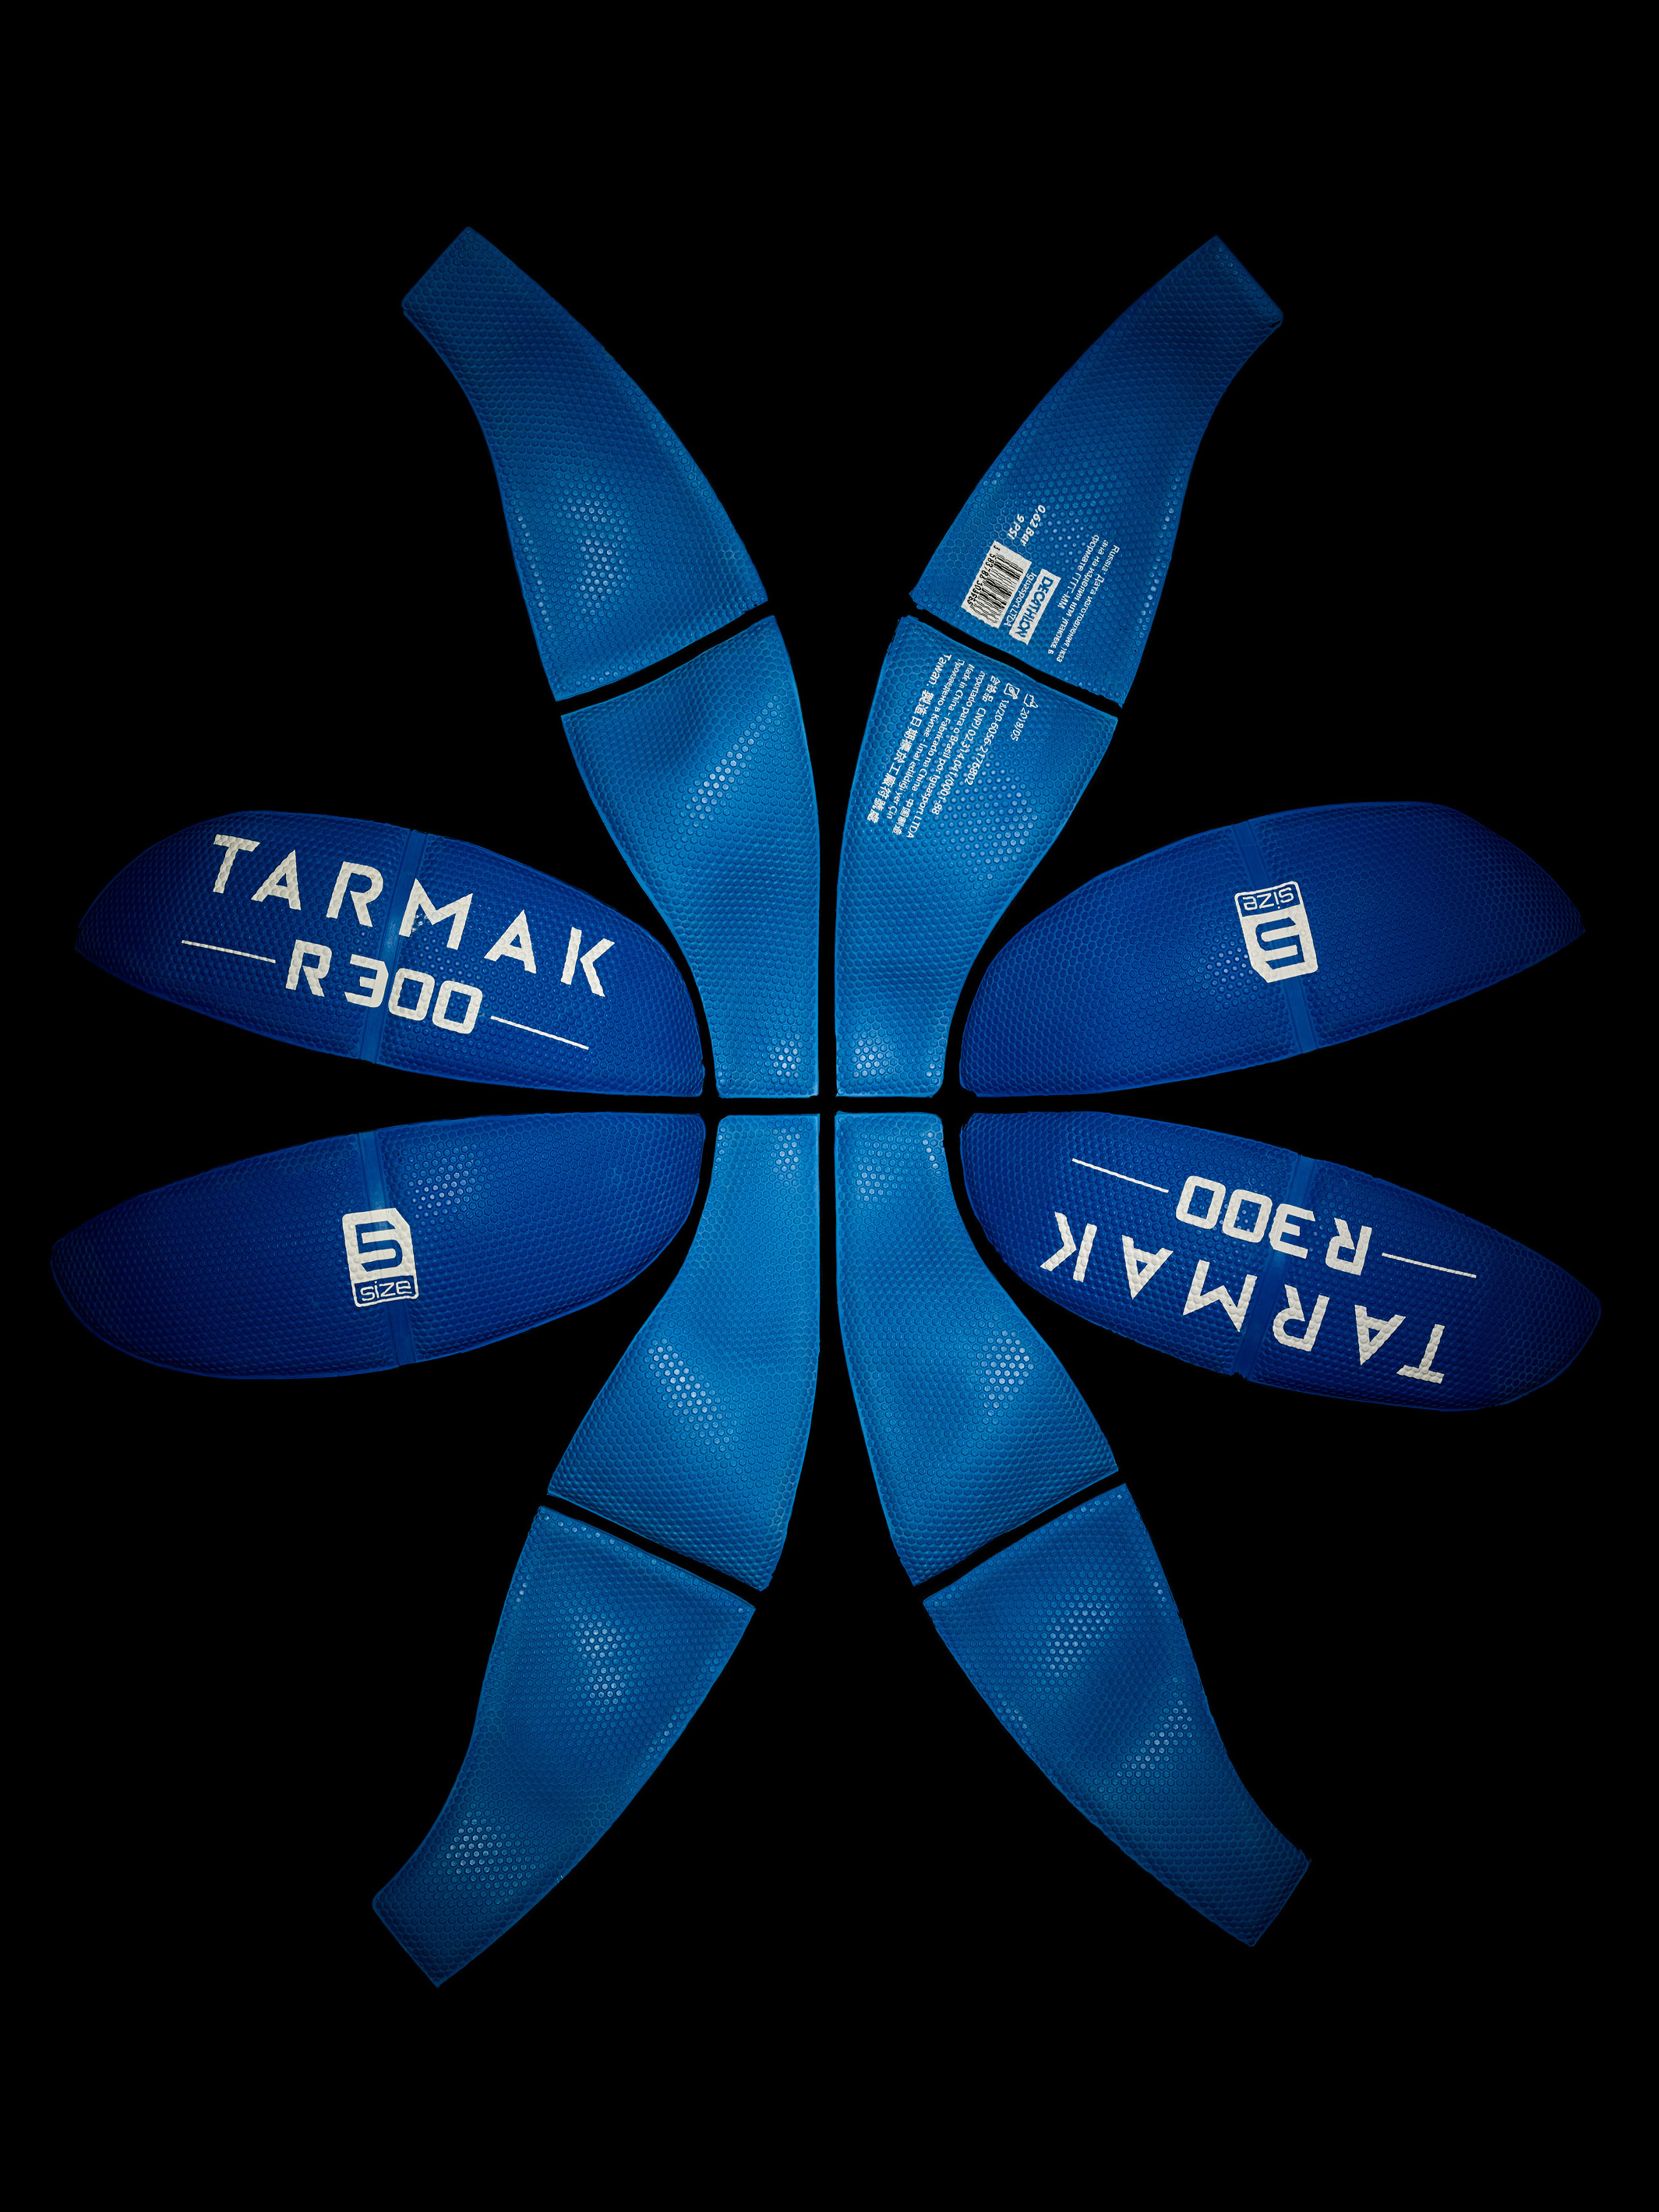 Tarmak r300, basketball, size 5, €7,99